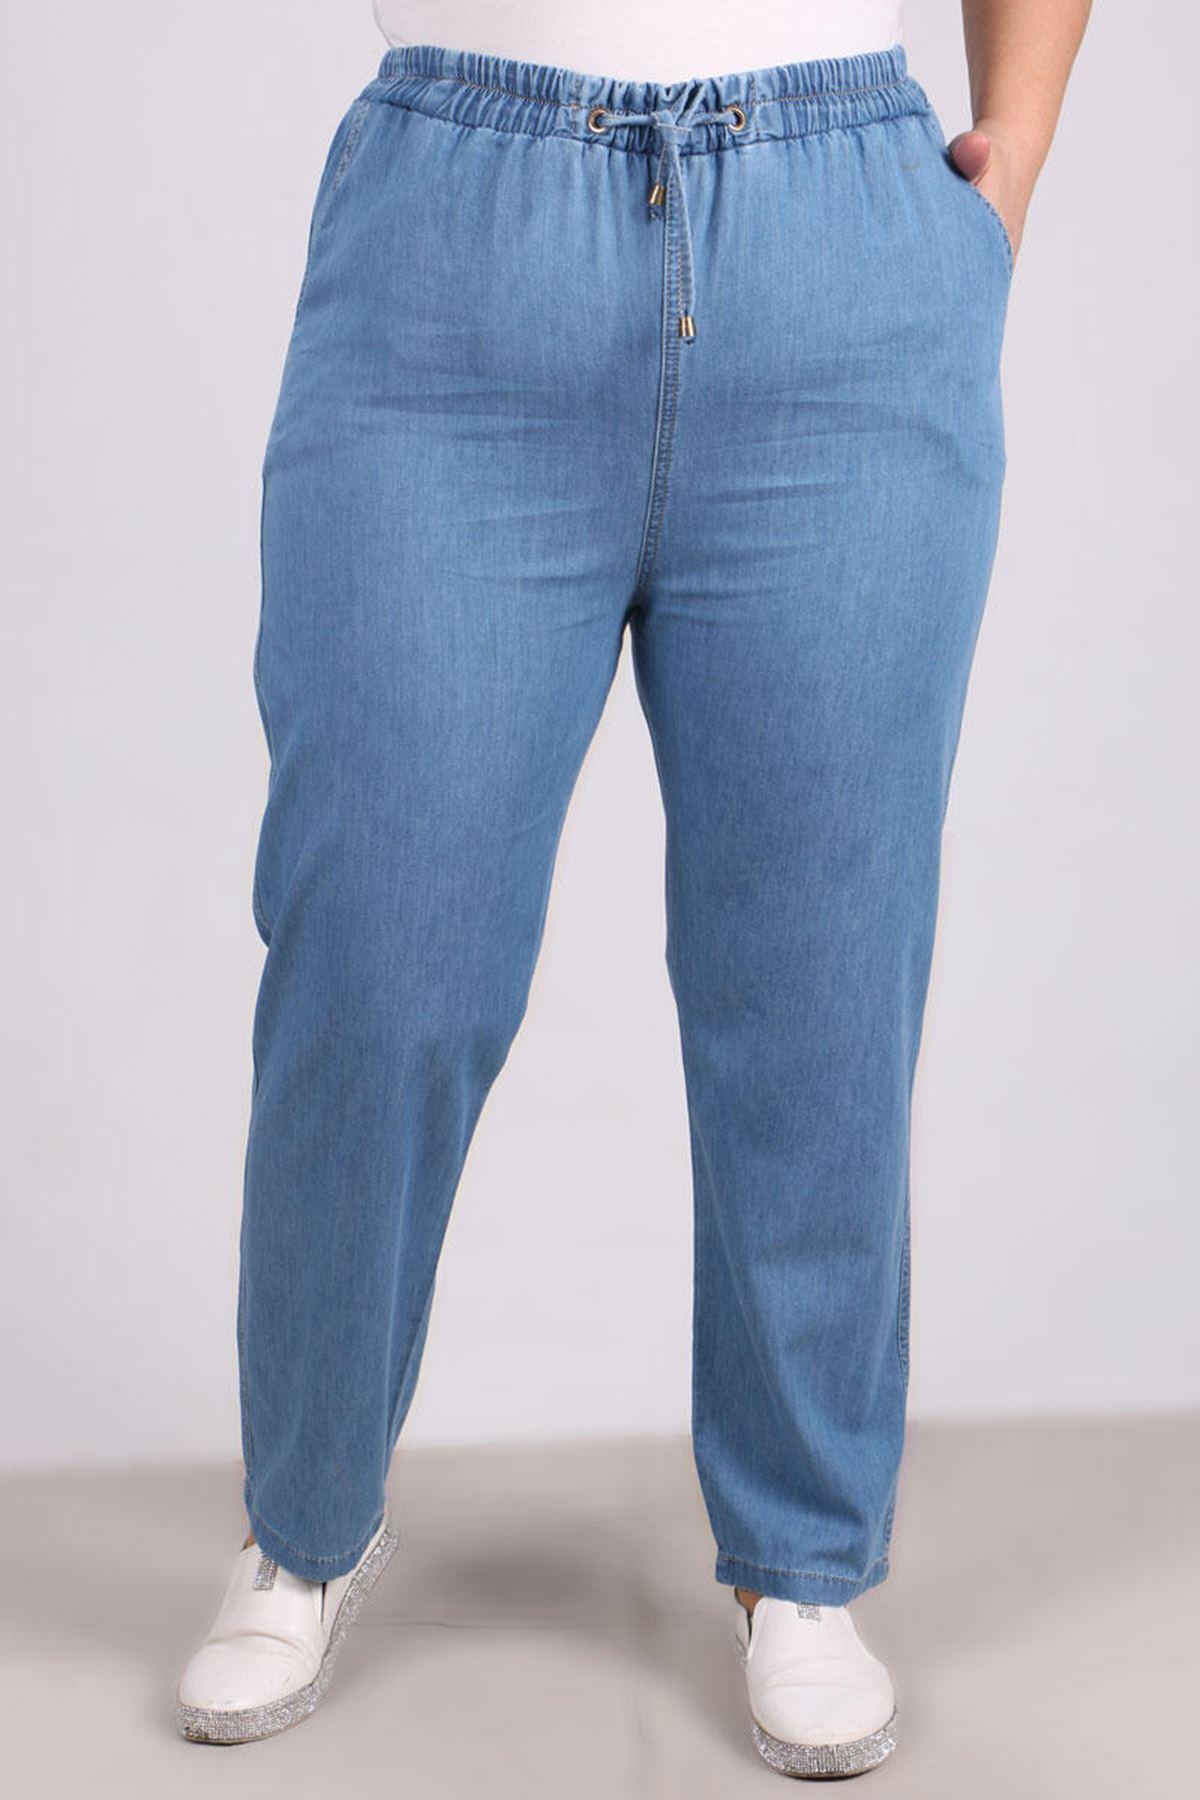 9123 Plus Size Elastic Waist Skinny Leg Jeans - Blue